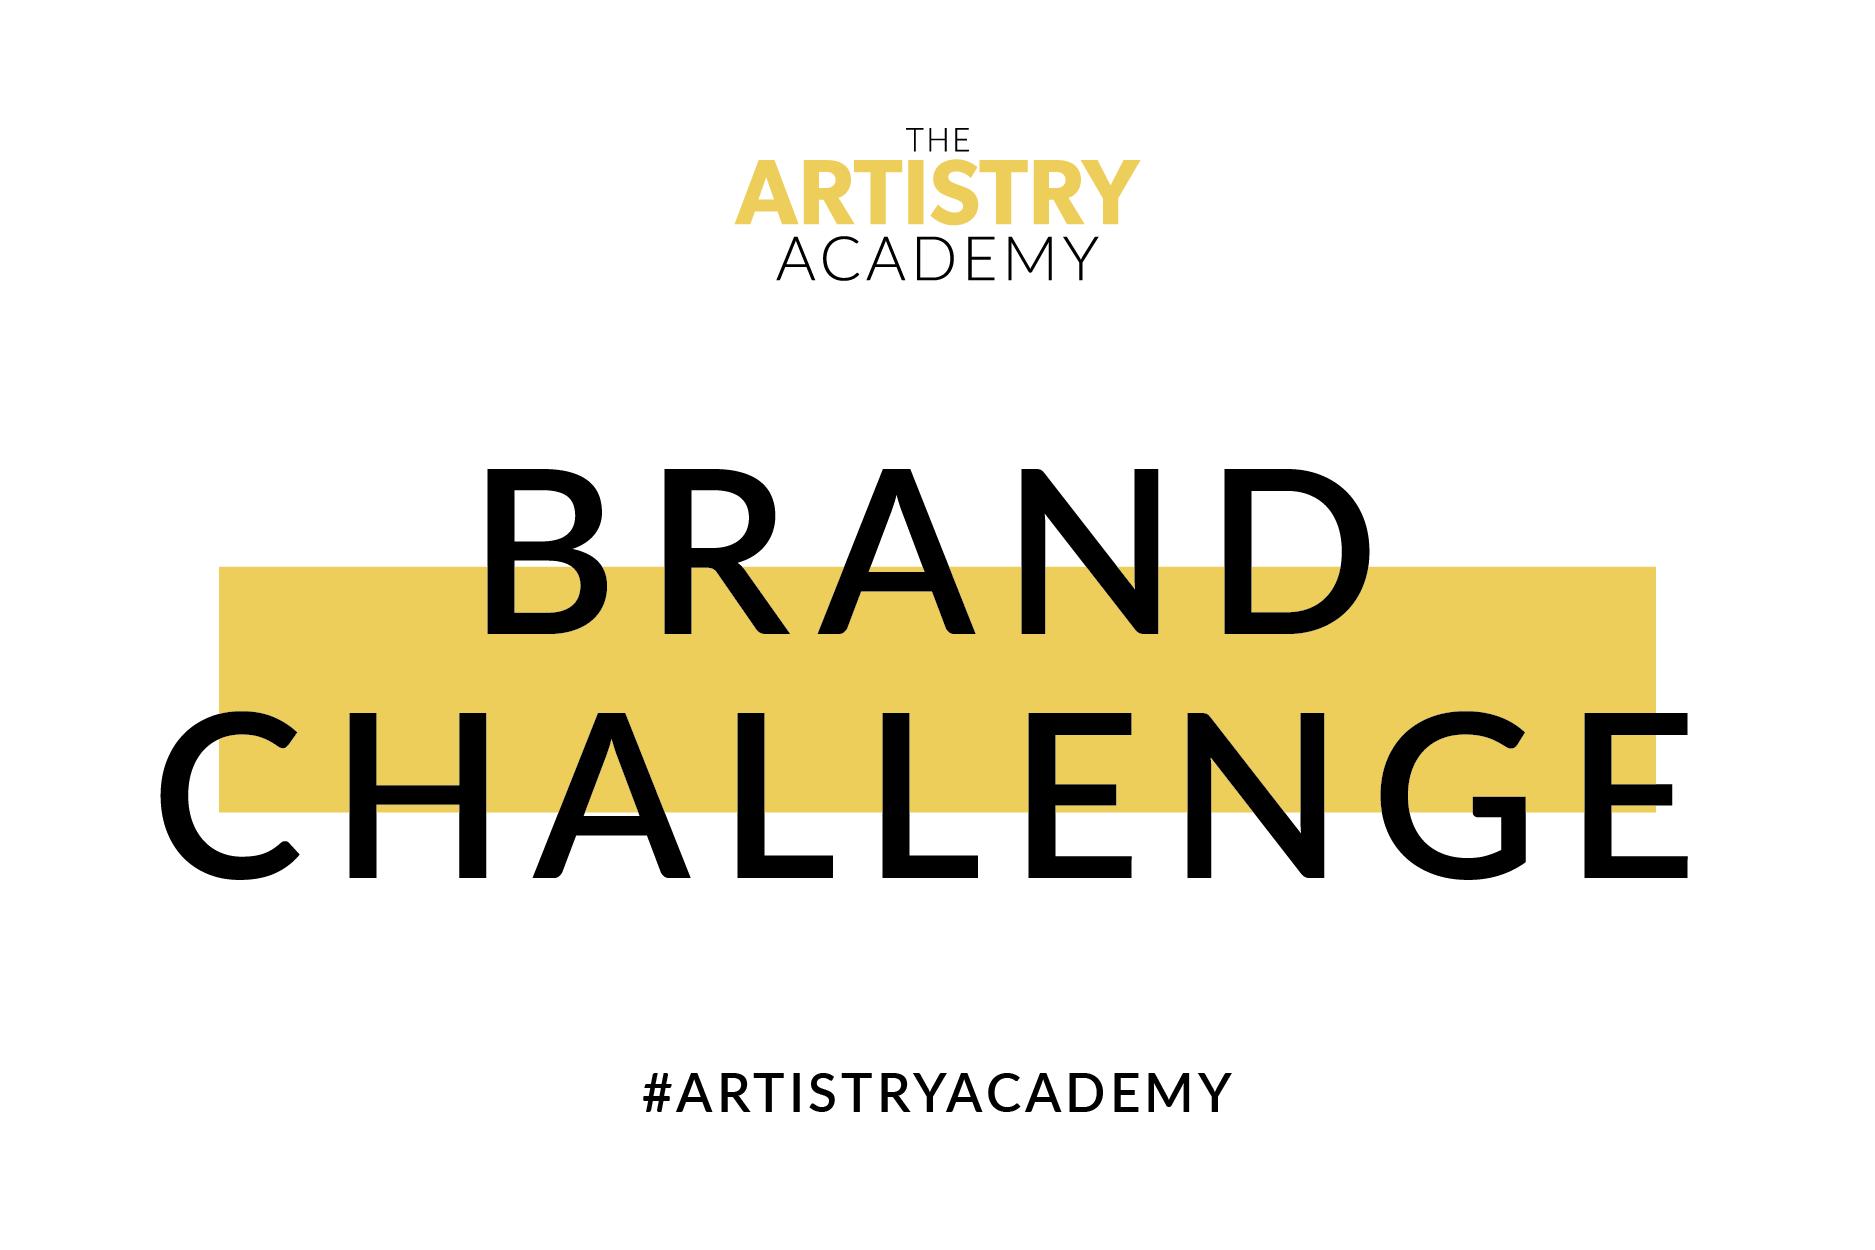 brand-challenge-01.png